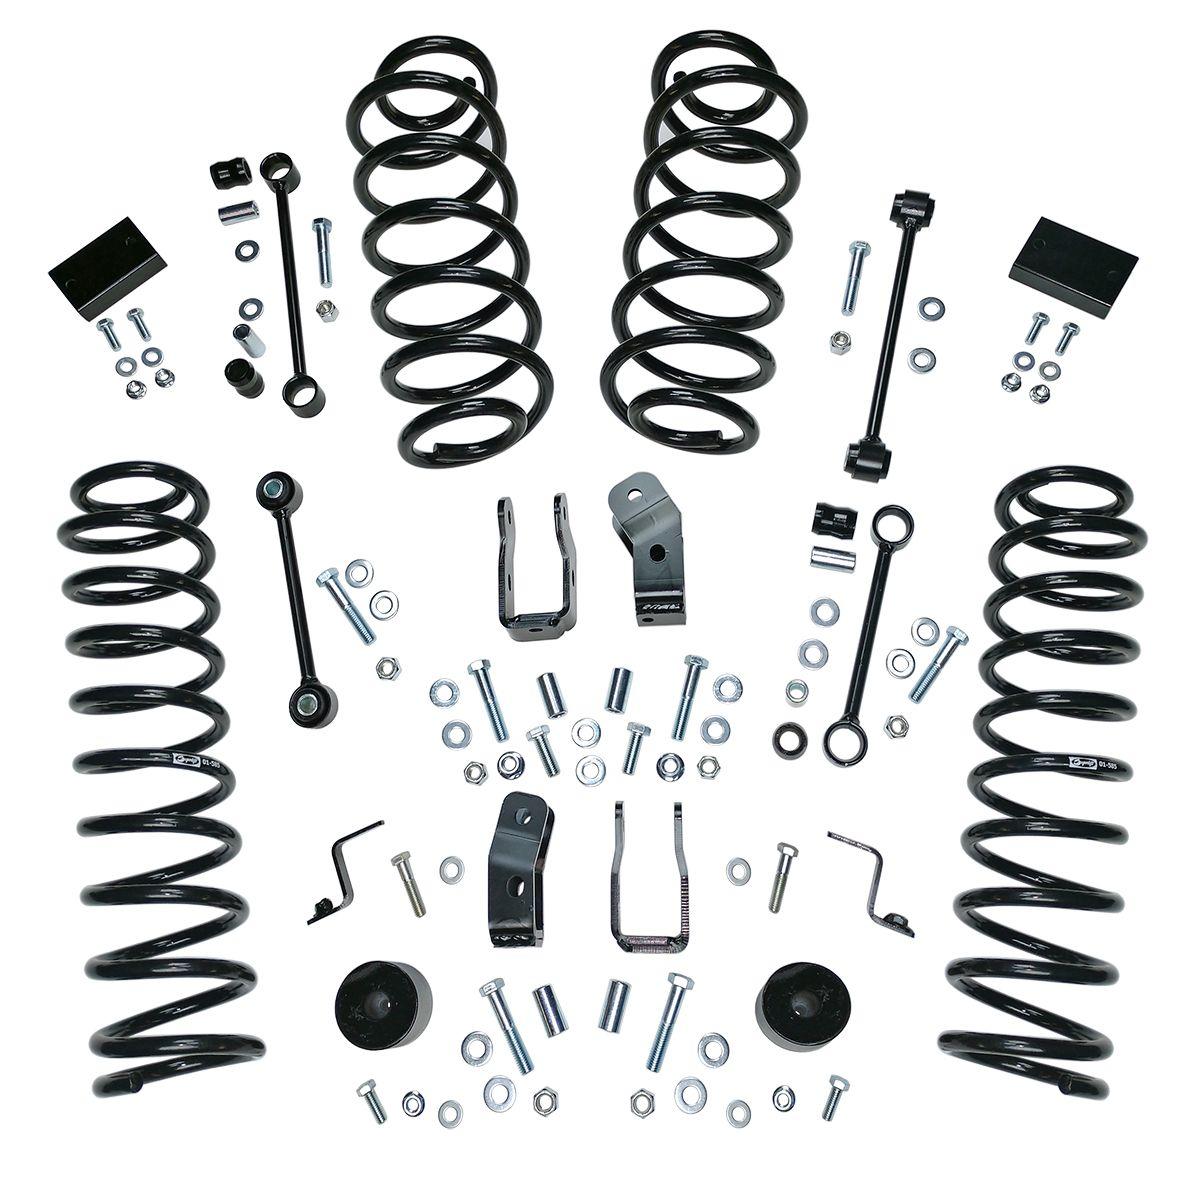 Aftermarket JL Lift Kit suspension options master list